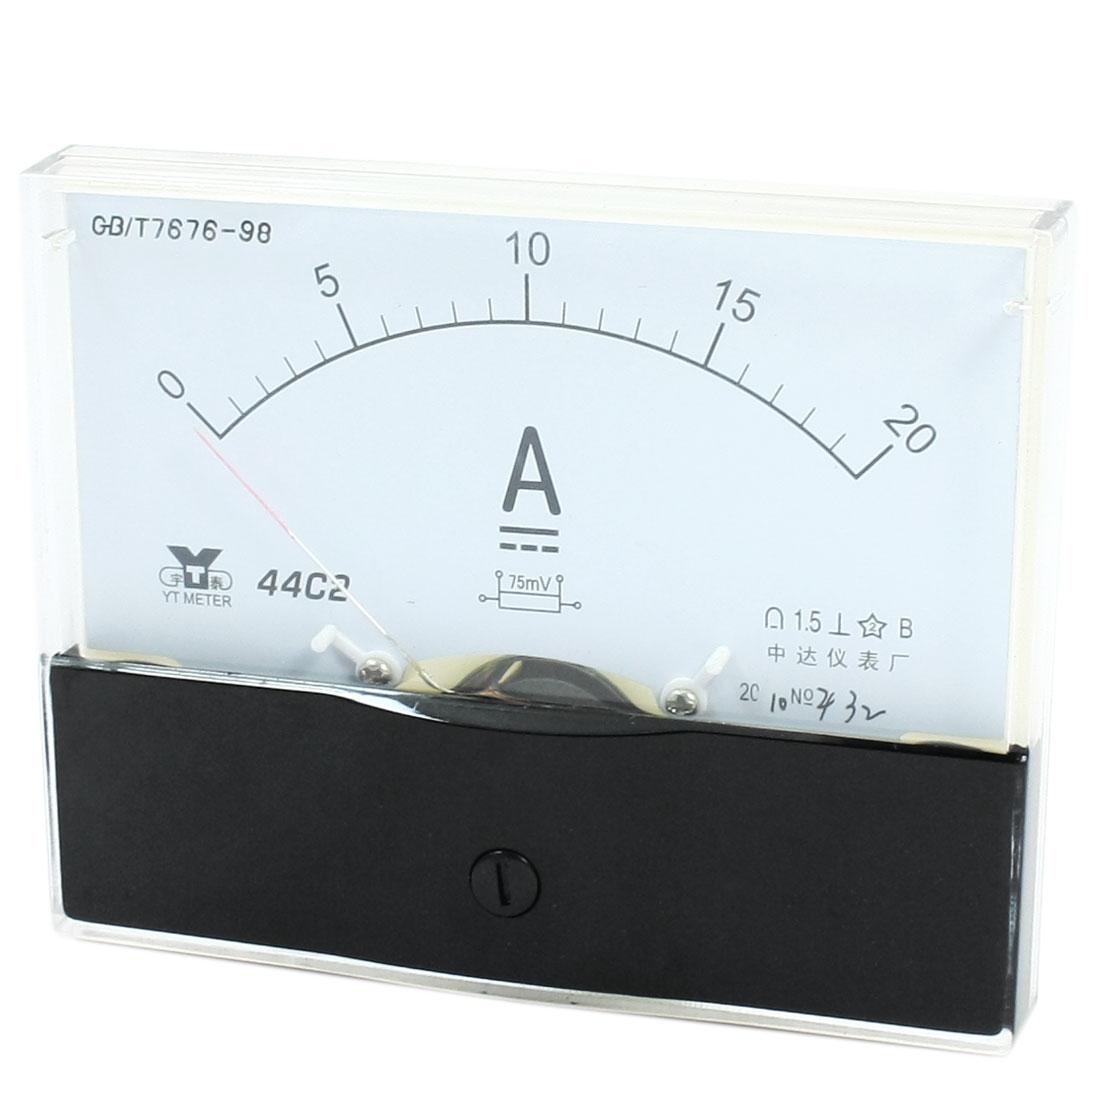 Rectangle Measurement Tool Analog Panel Ammeter Gauge DC 0 - 20A Measuring Range 44C2